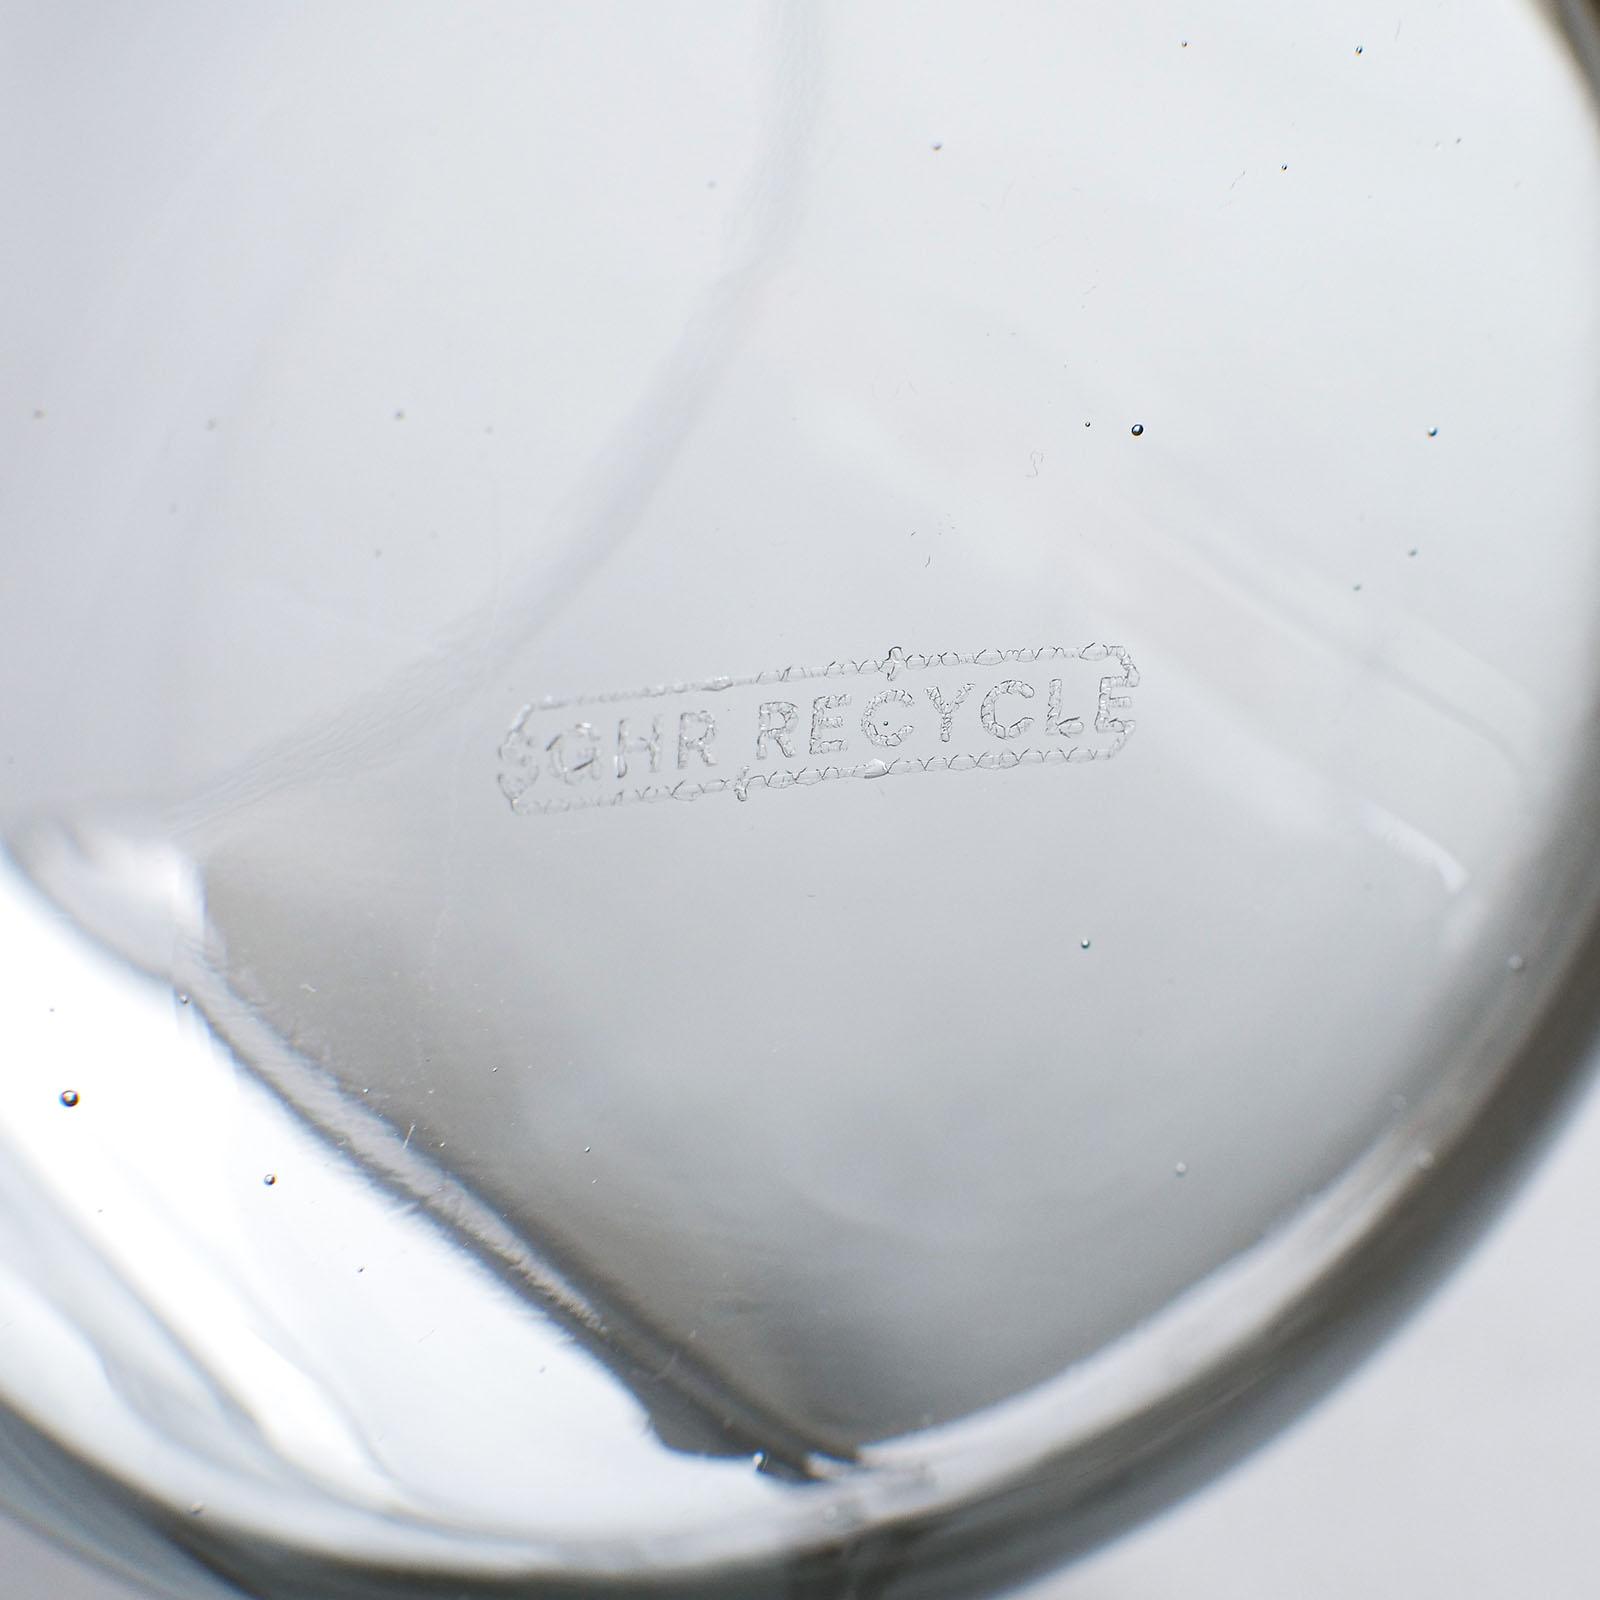 Sghr Recycle:オールド (S)